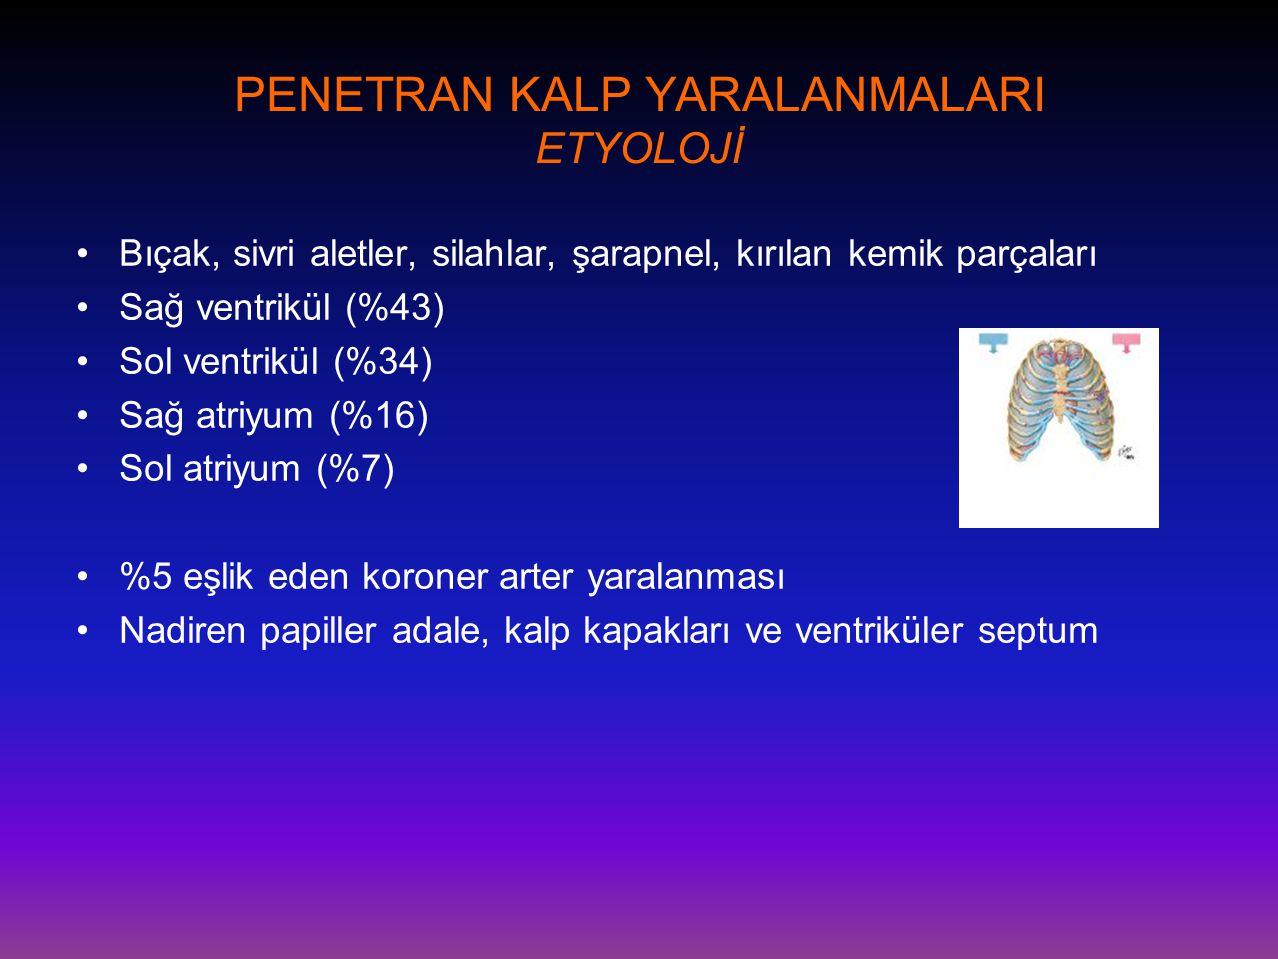 PENETRAN KALP YARALANMALARI ETYOLOJİ